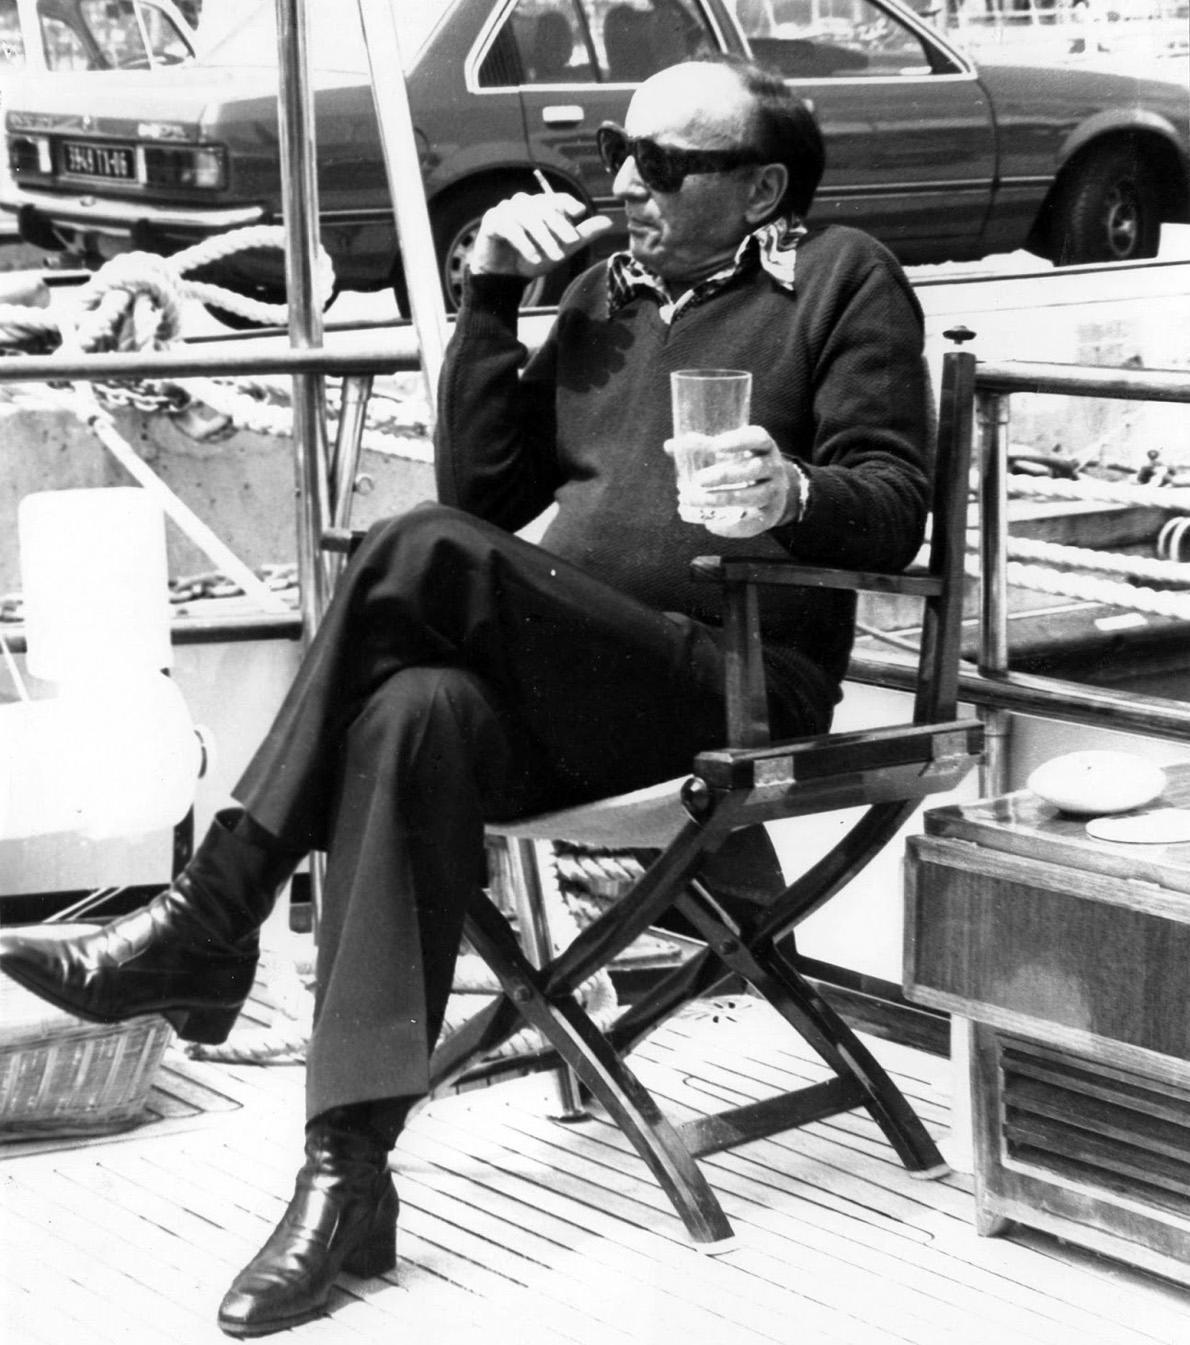 harold robbins 1970s sunglasses